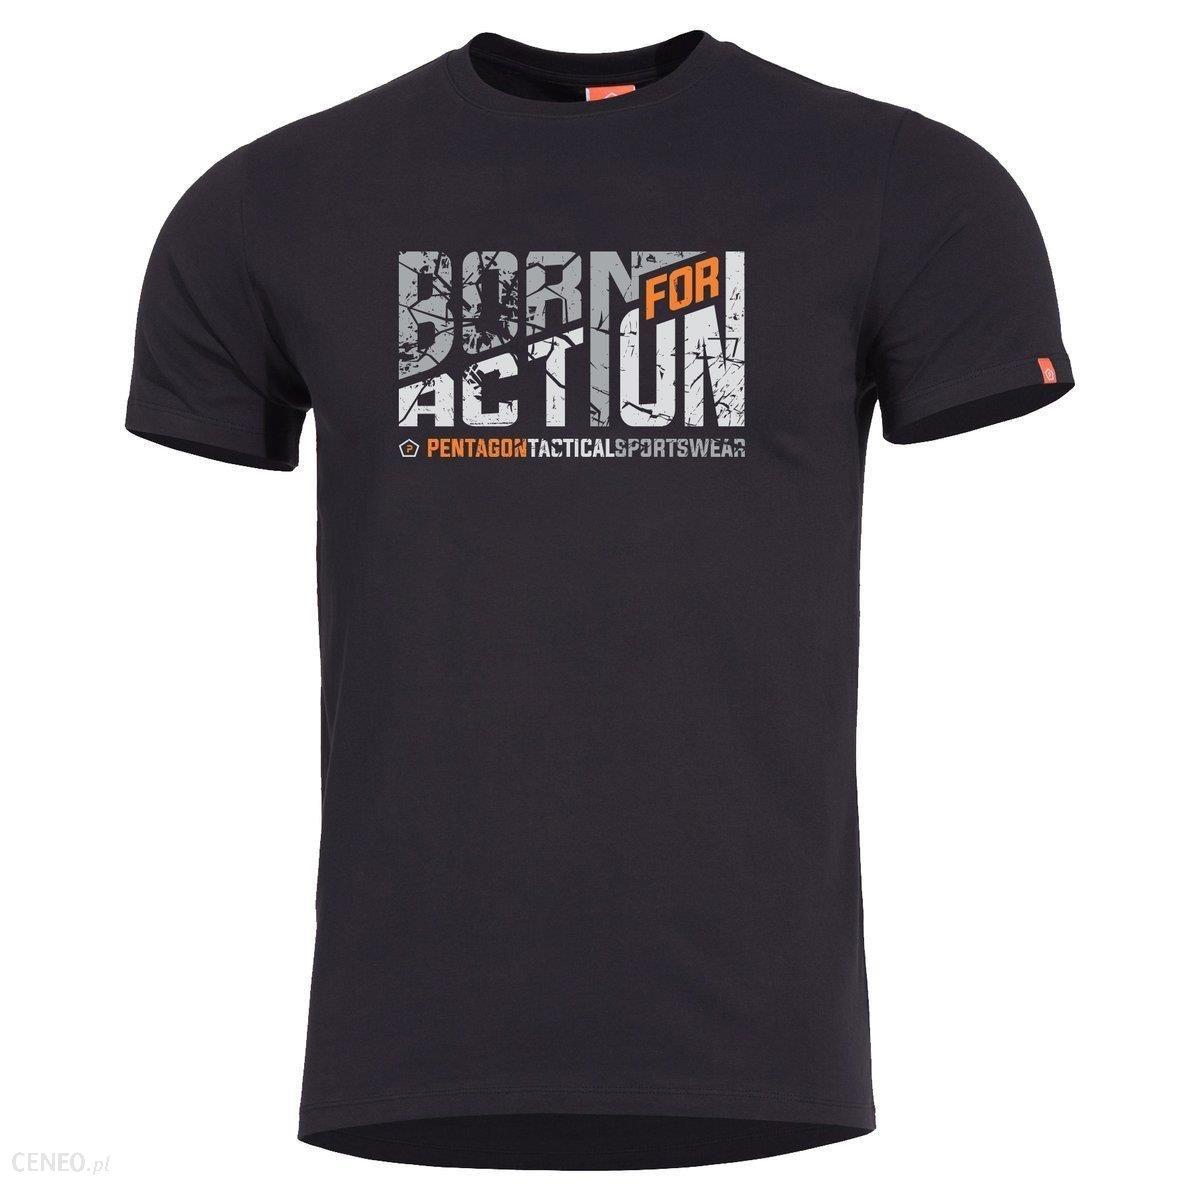 Pentagon T-Shirt Ageron Born For Action Black (K09012-Ba-01)